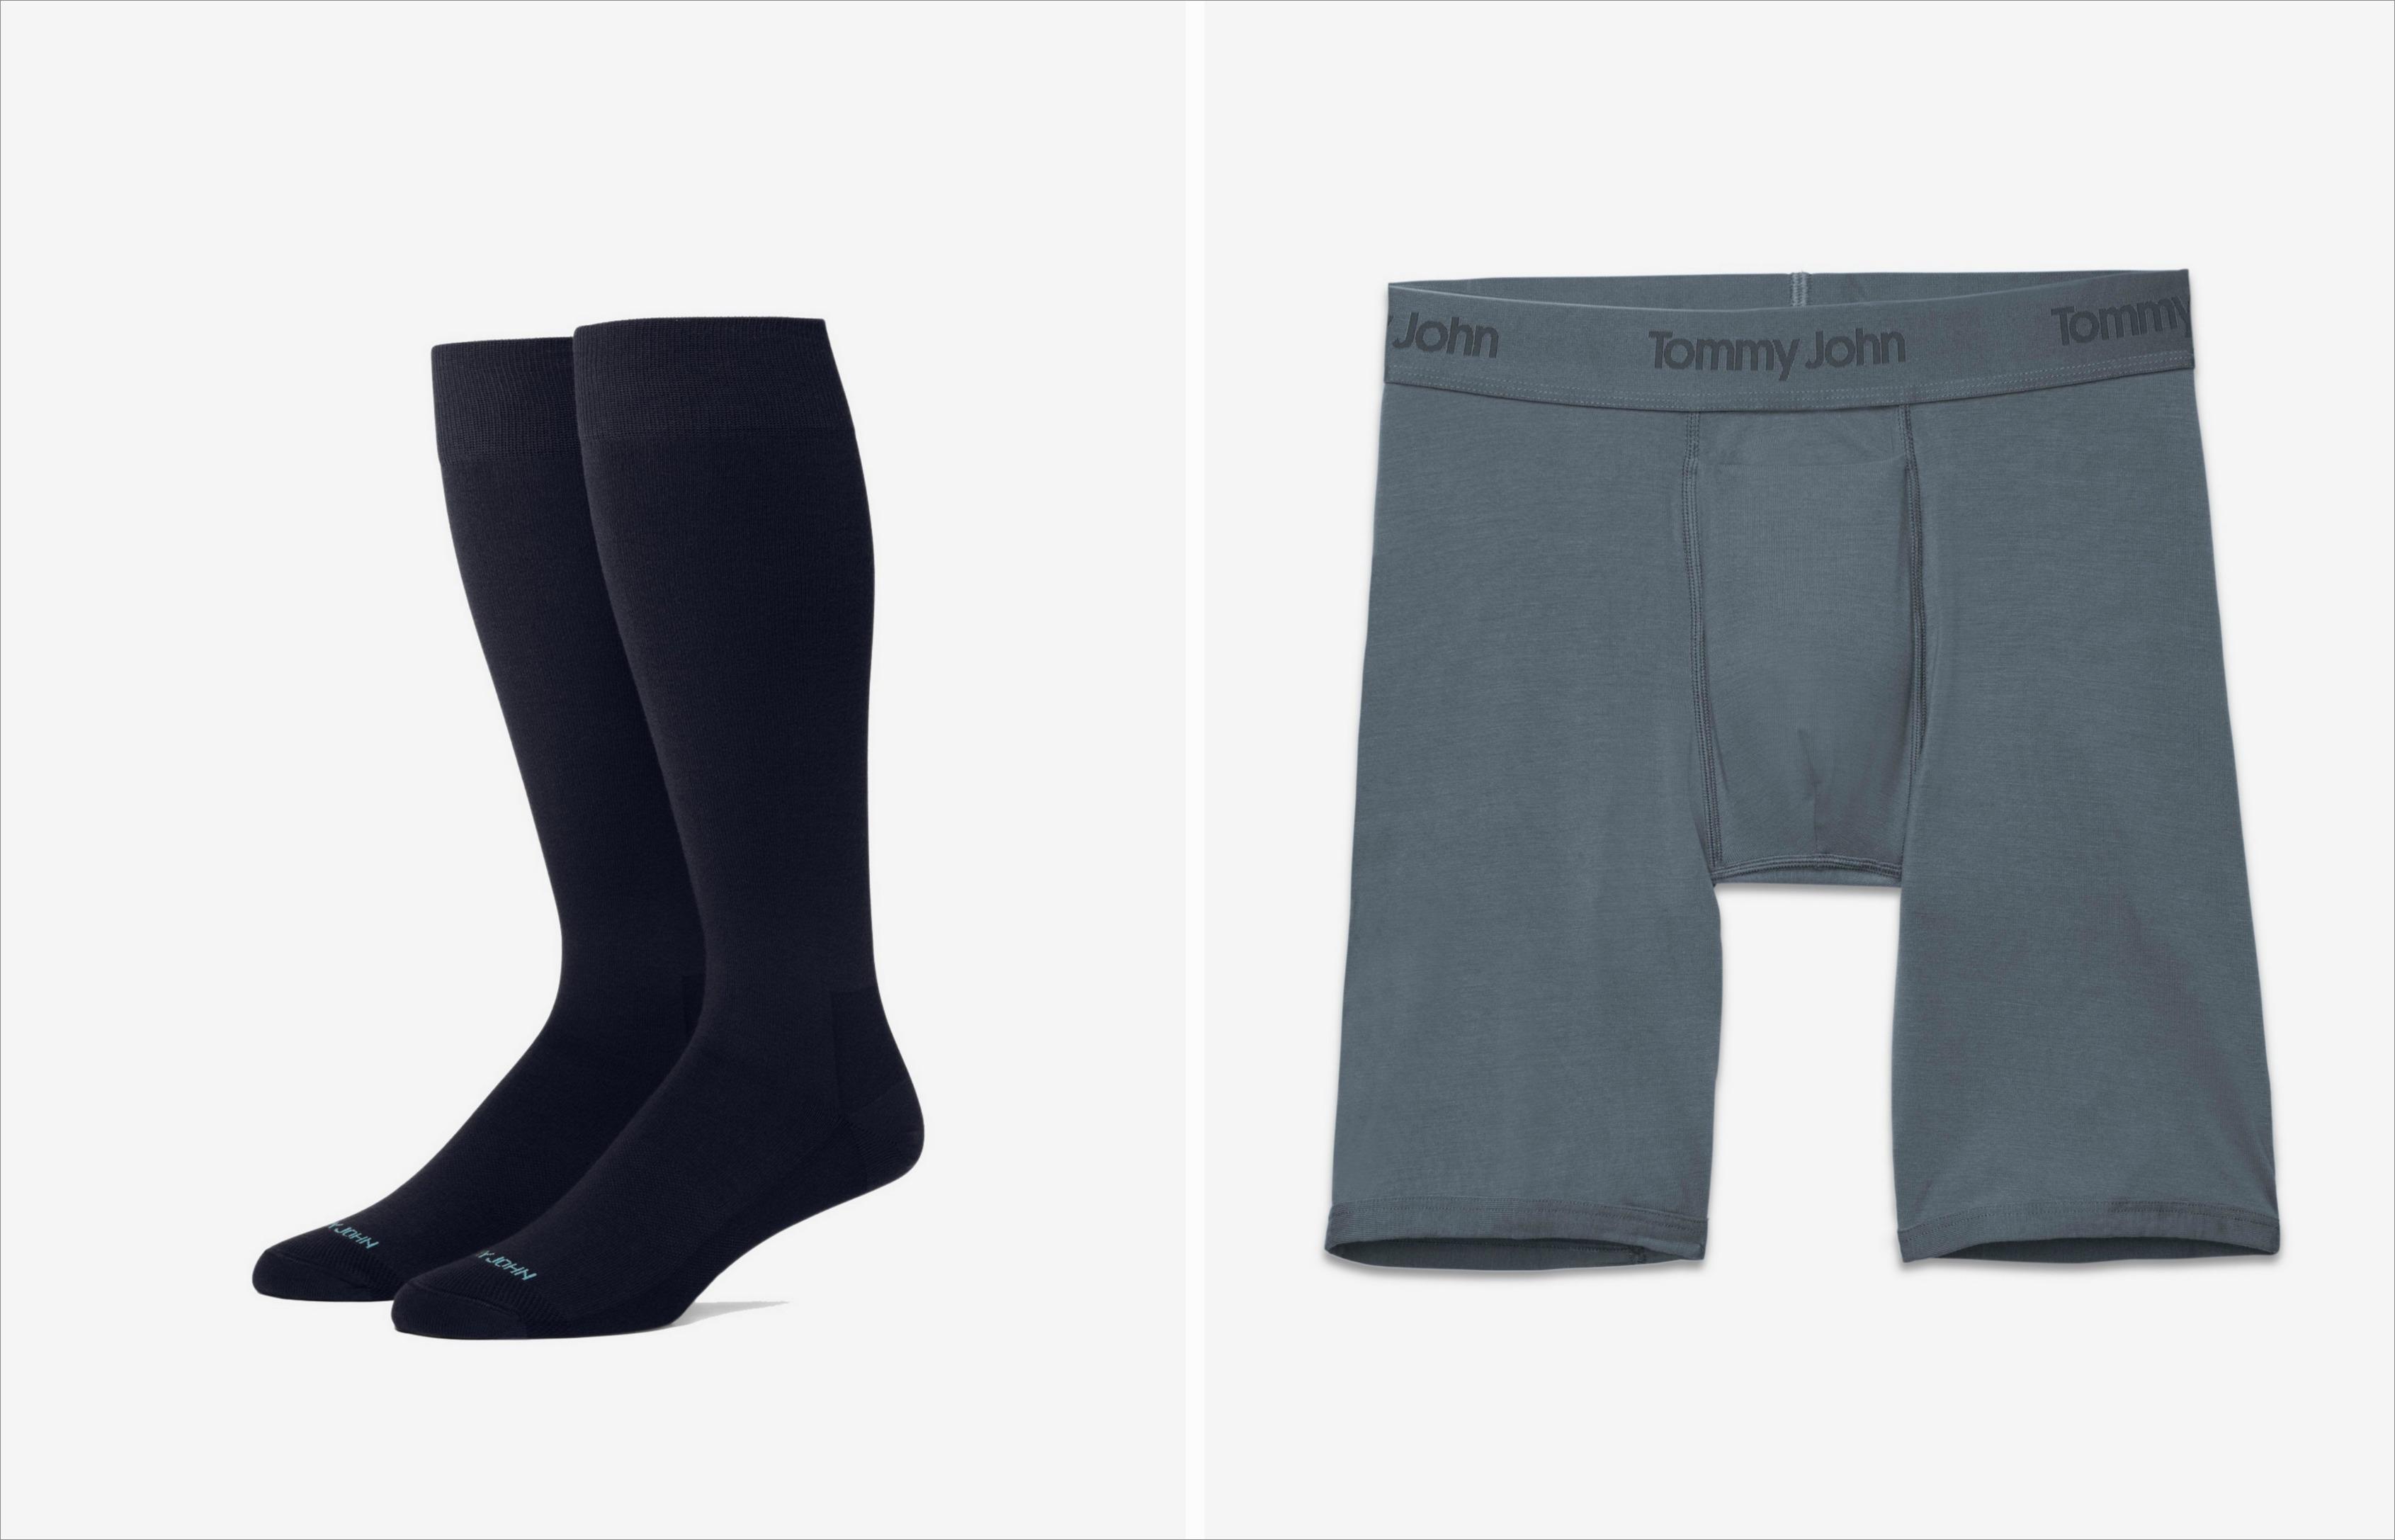 Tommy John socks and underwear for men